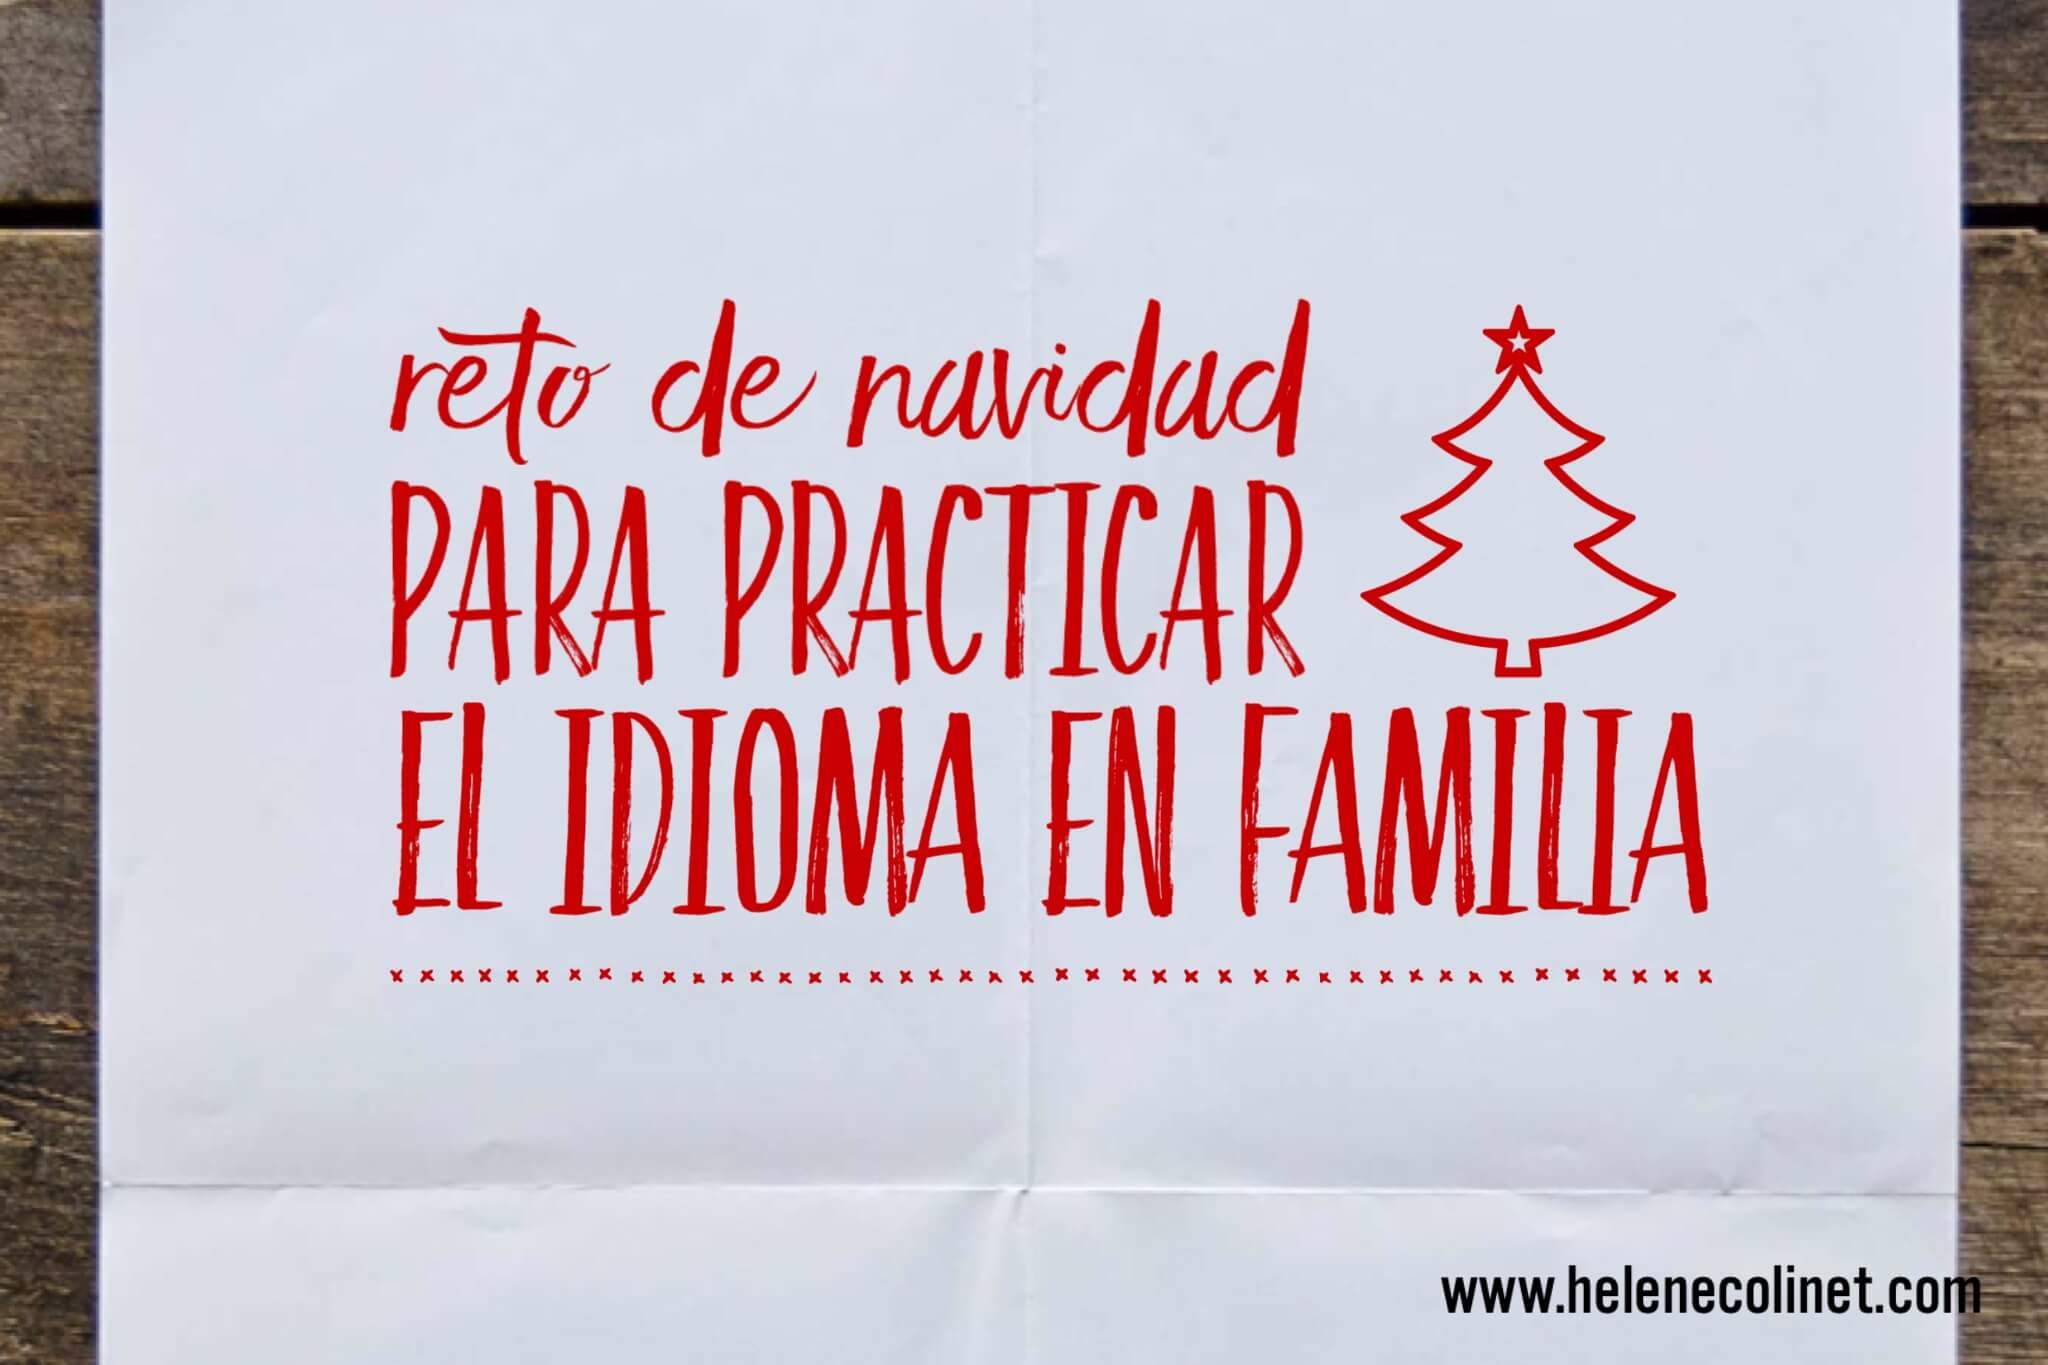 reto navidad helene colinet recursos profesores idiomas tprs españa